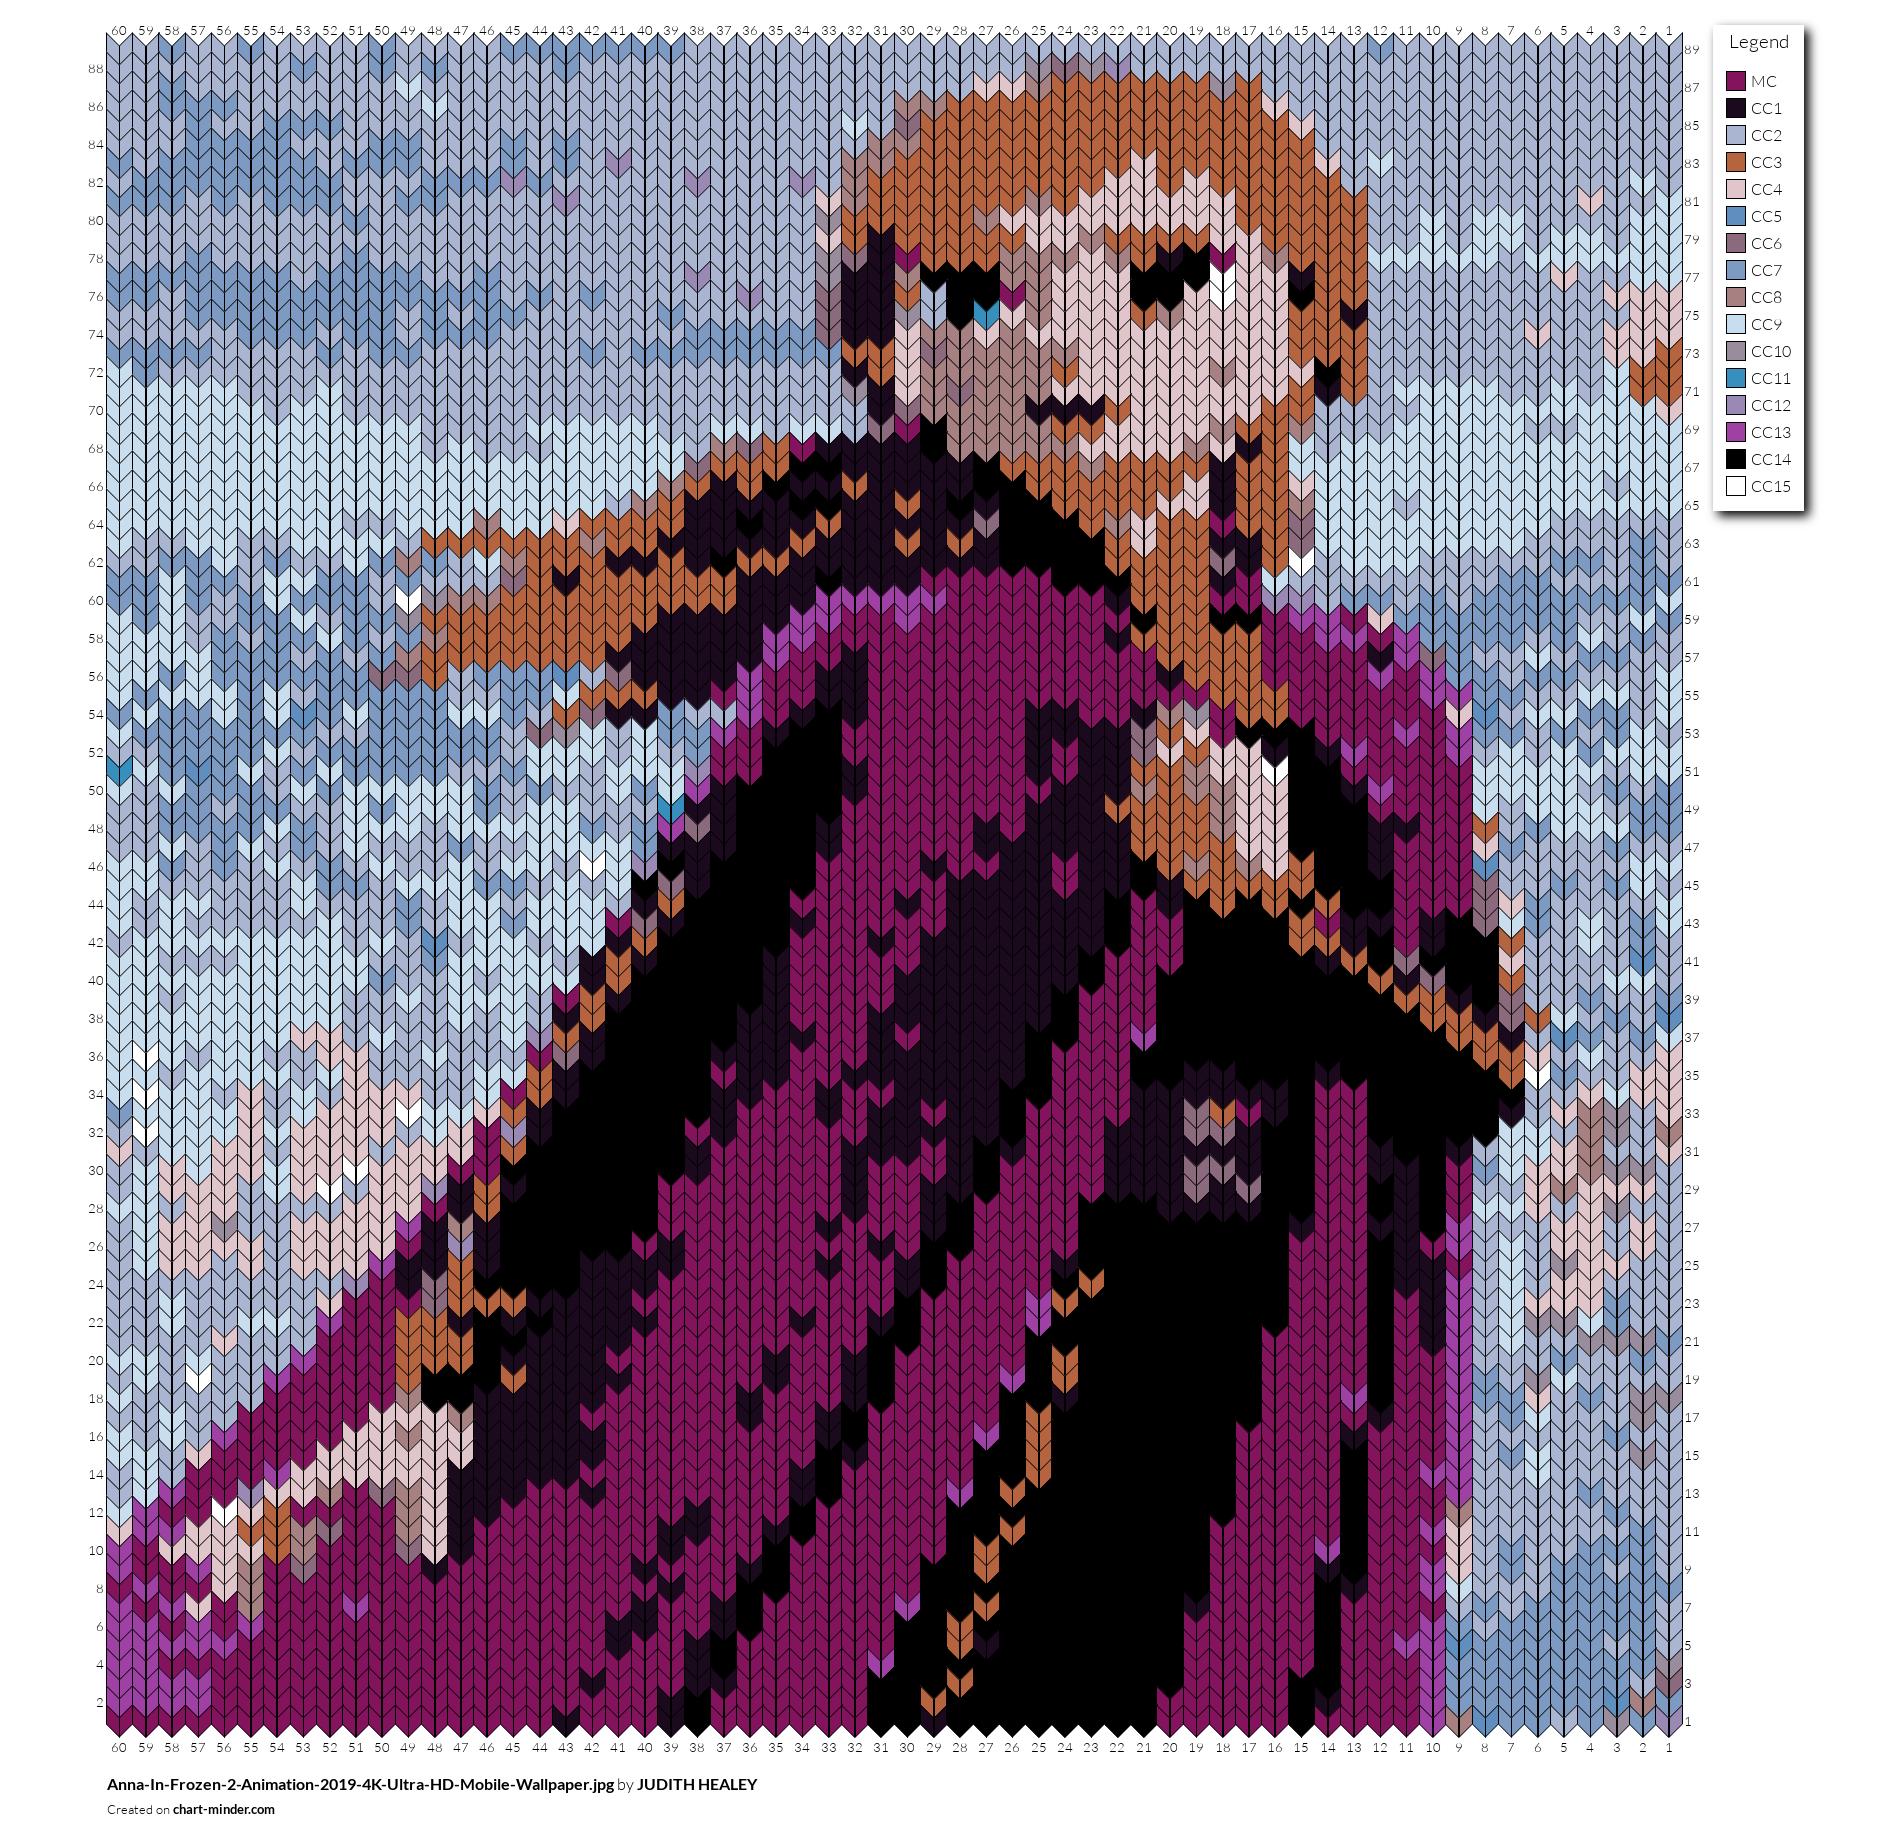 Anna-In-Frozen-2-Animation-2019-4K-Ultra-HD-Mobile-Wallpaper.jpg